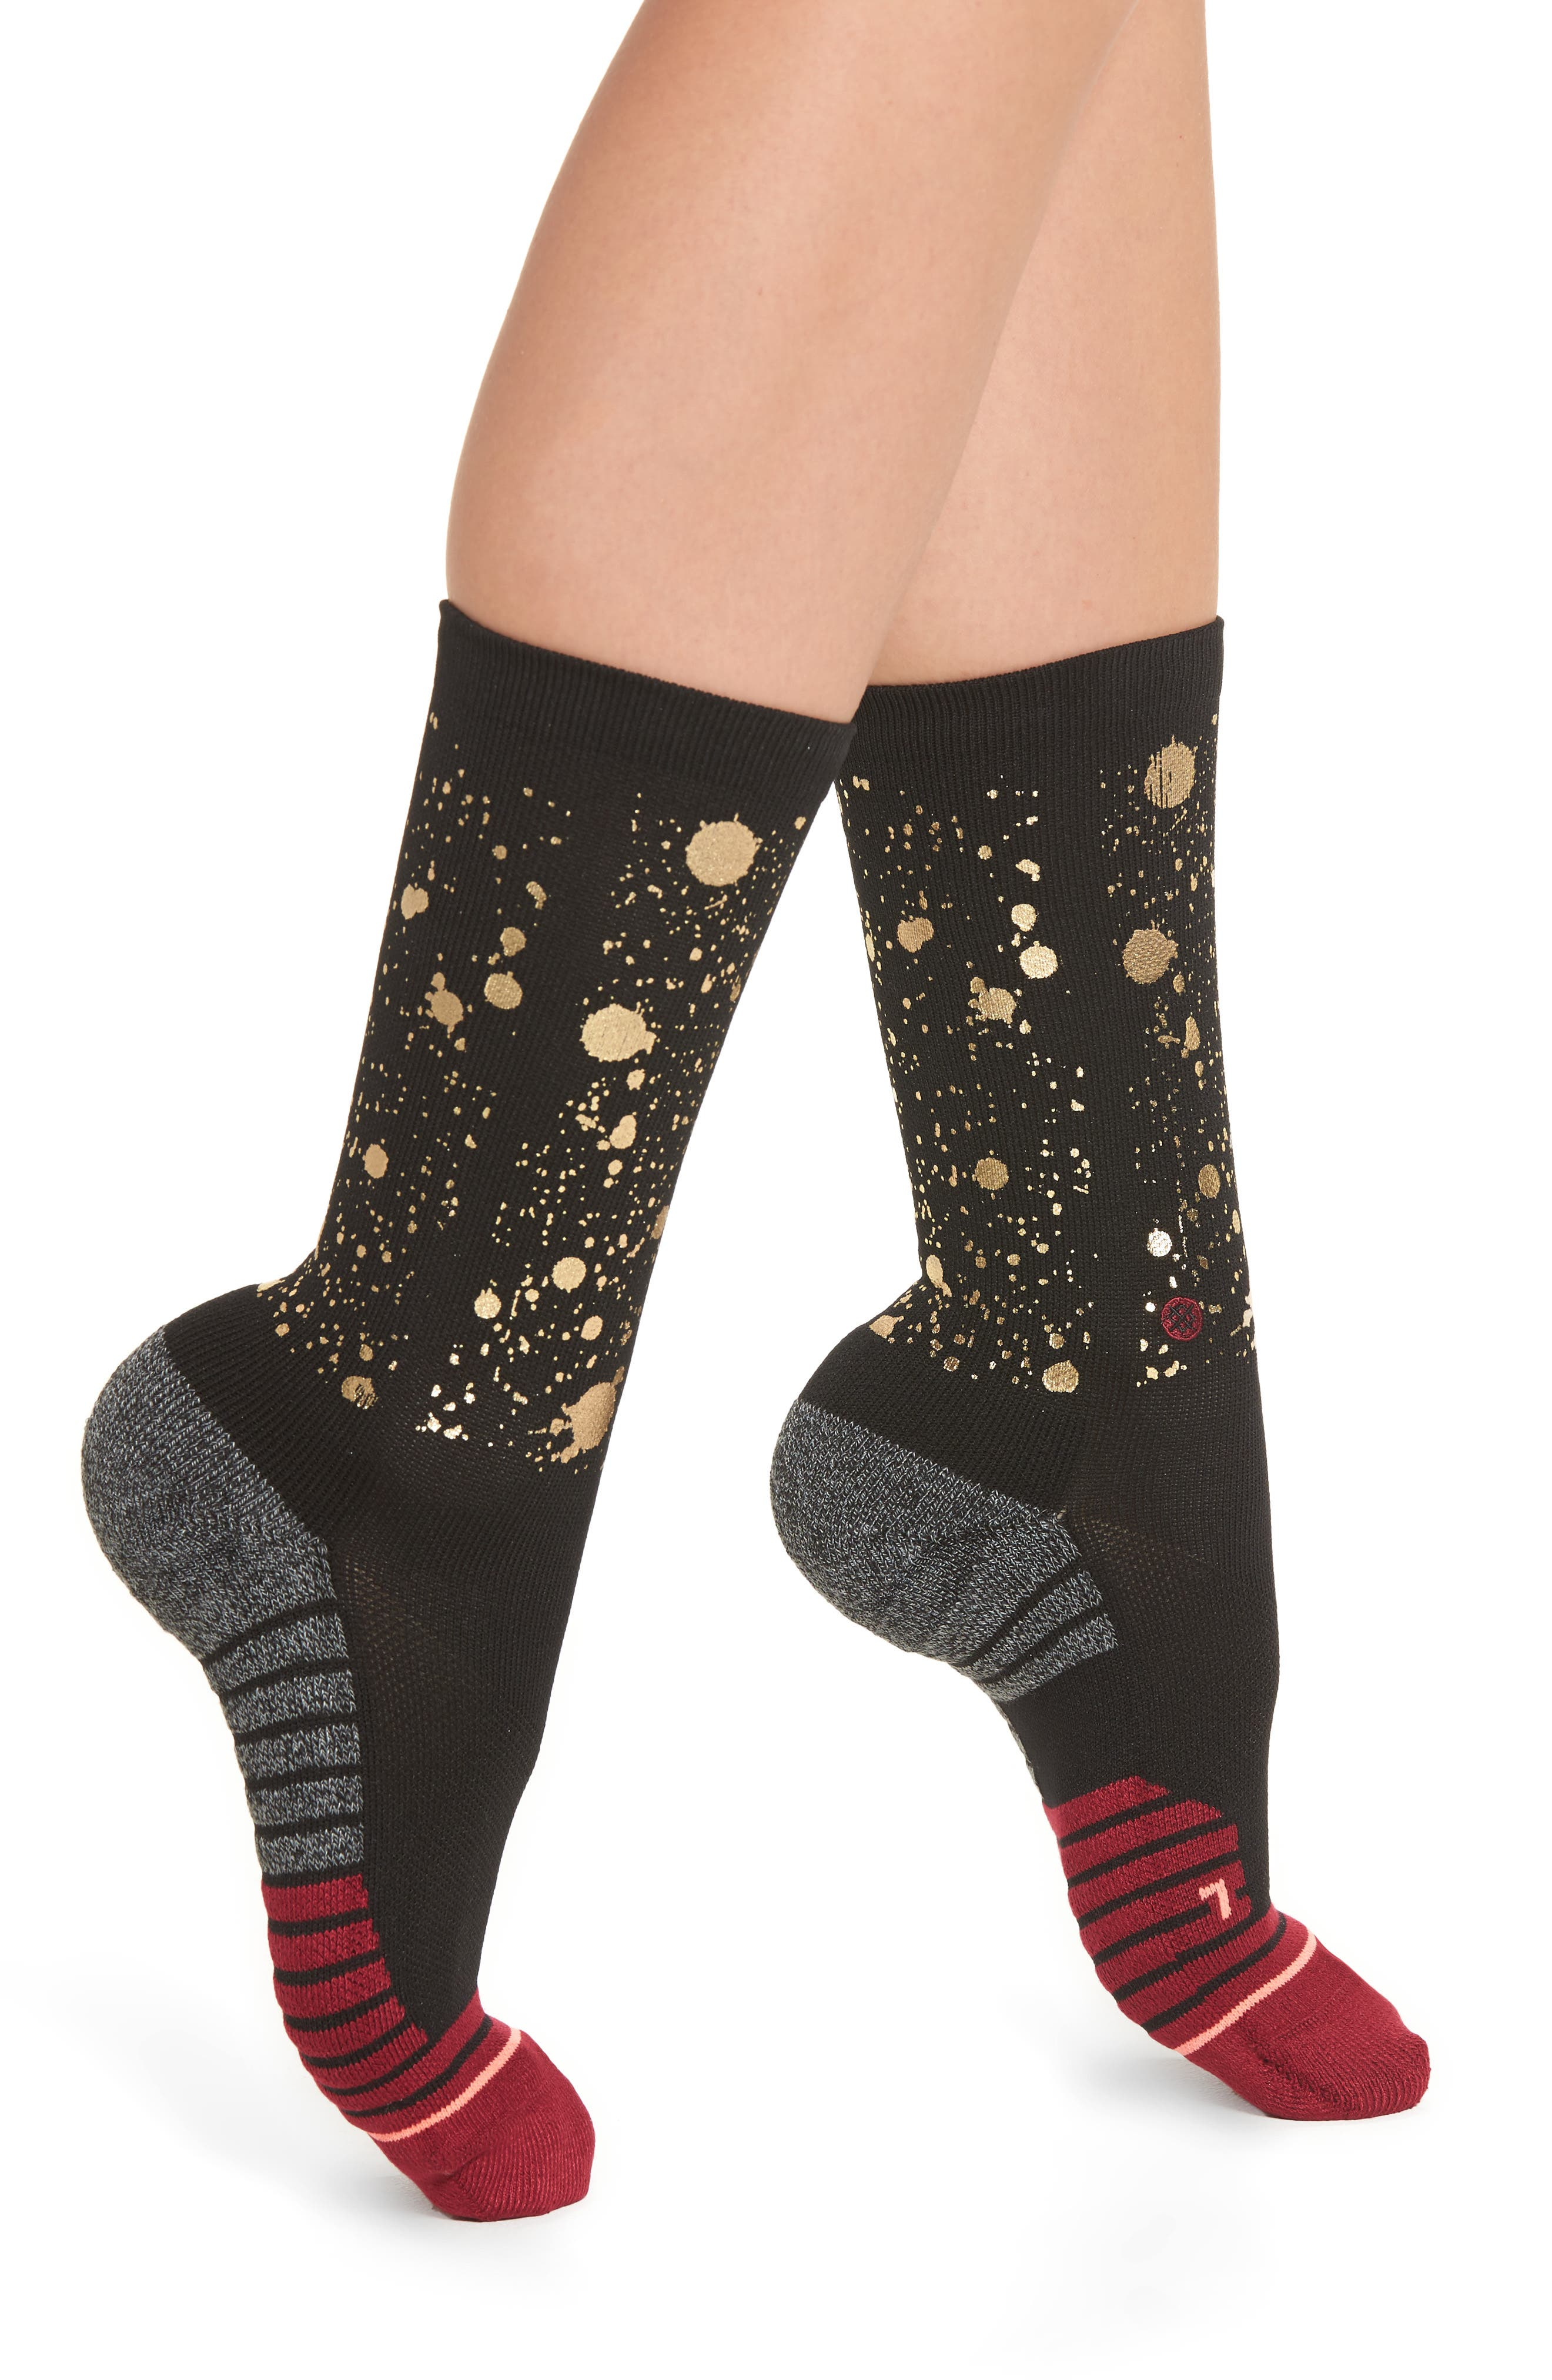 Endorphin Training Socks,                         Main,                         color, Black